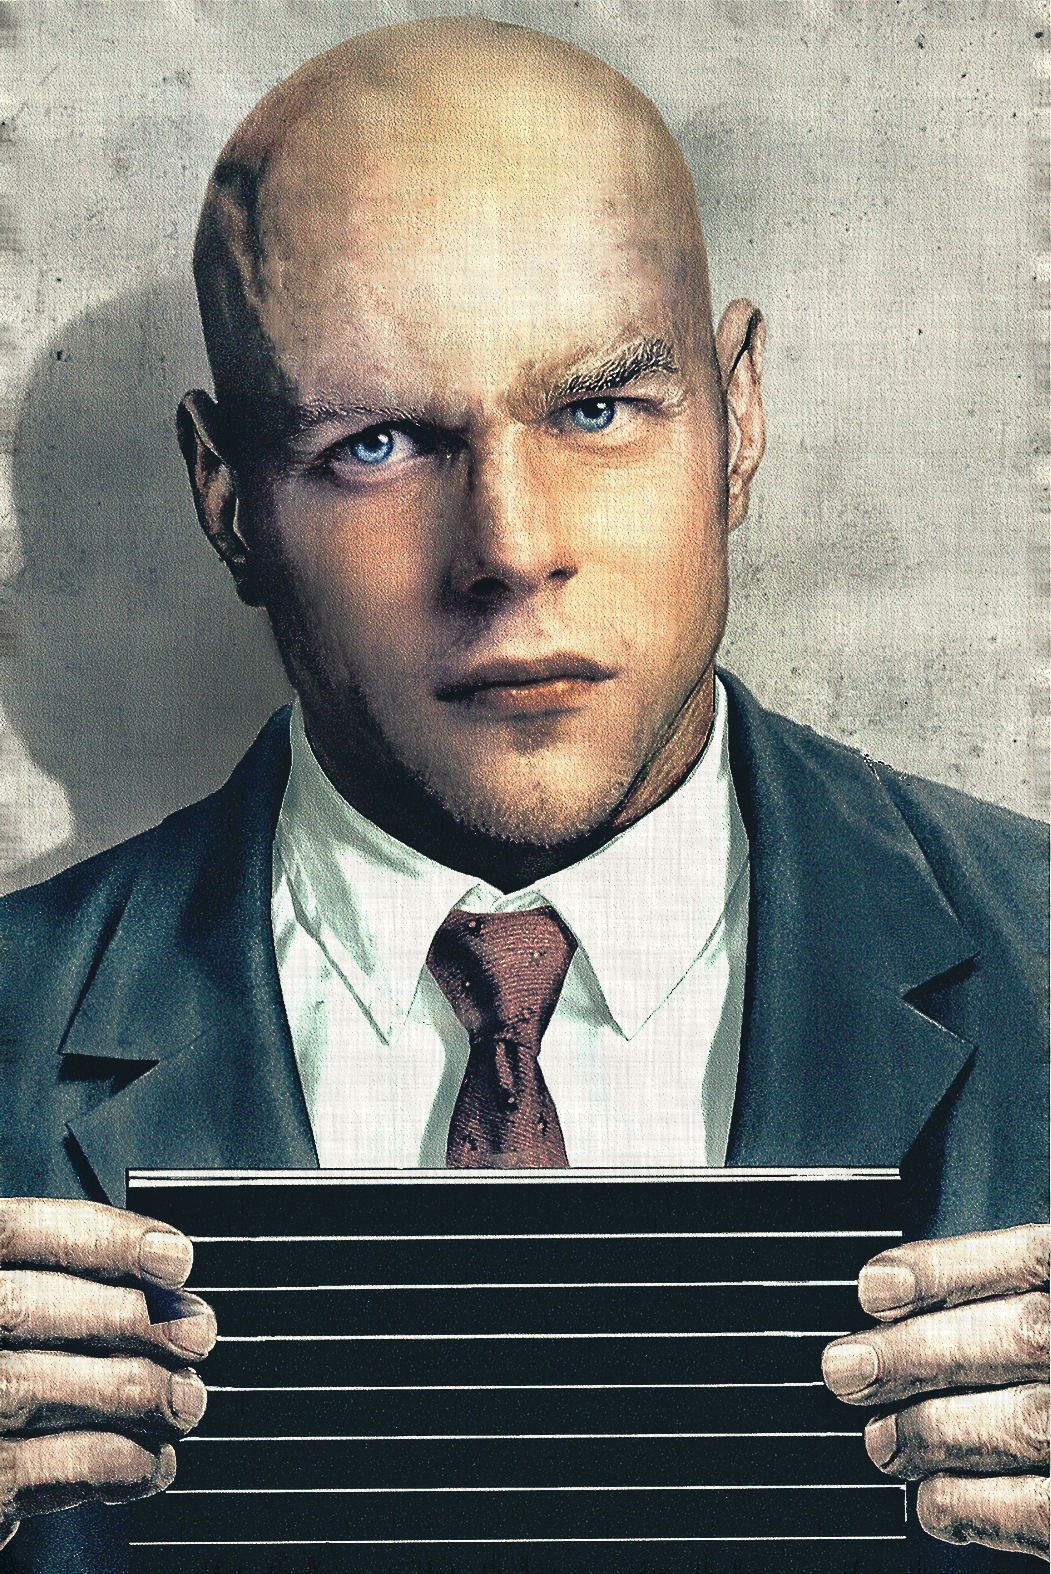 Jesse Eisenberg as Lex Luthor by Darren1987